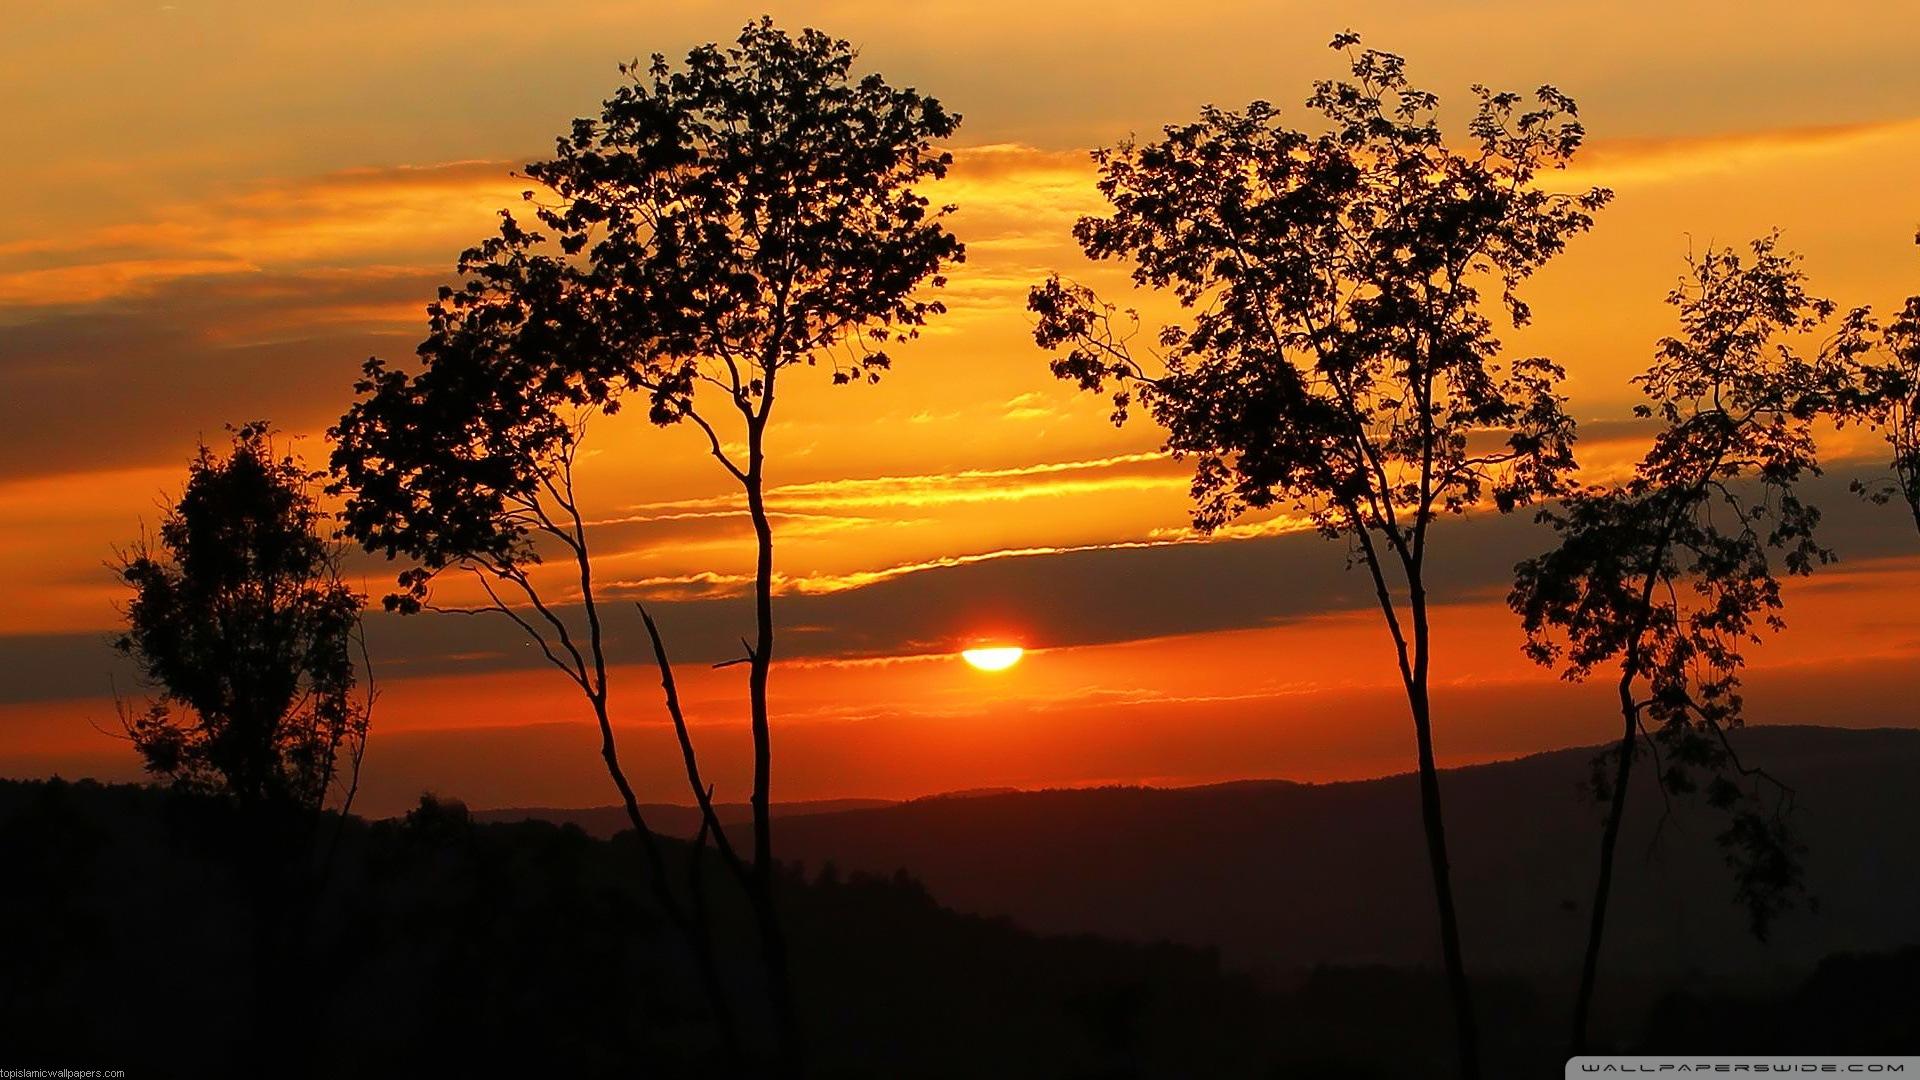 Sunrise HD Wallpaper